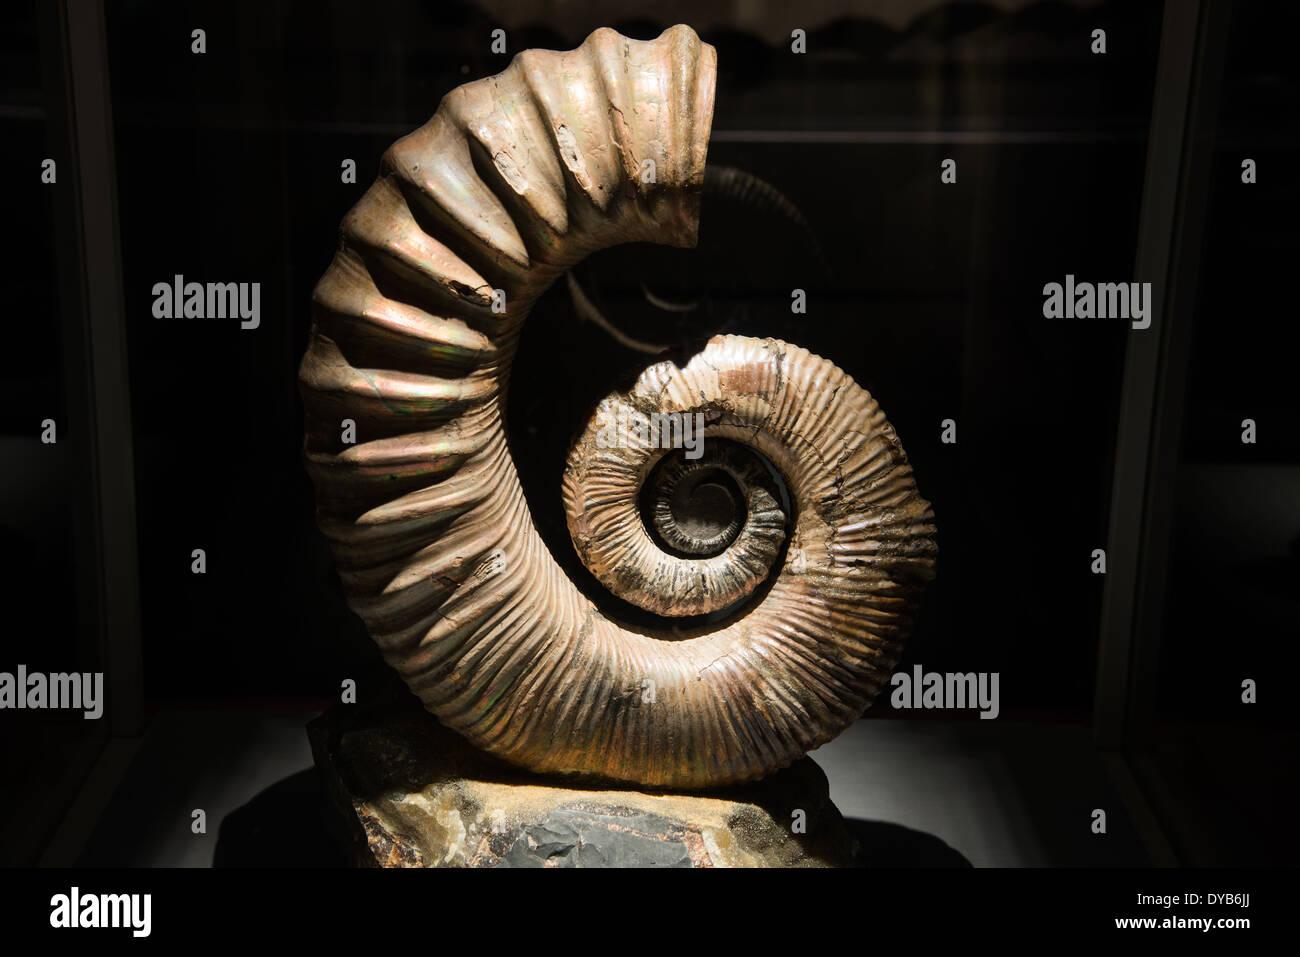 Fossil ammonite. Cretaceous age. - Stock Image